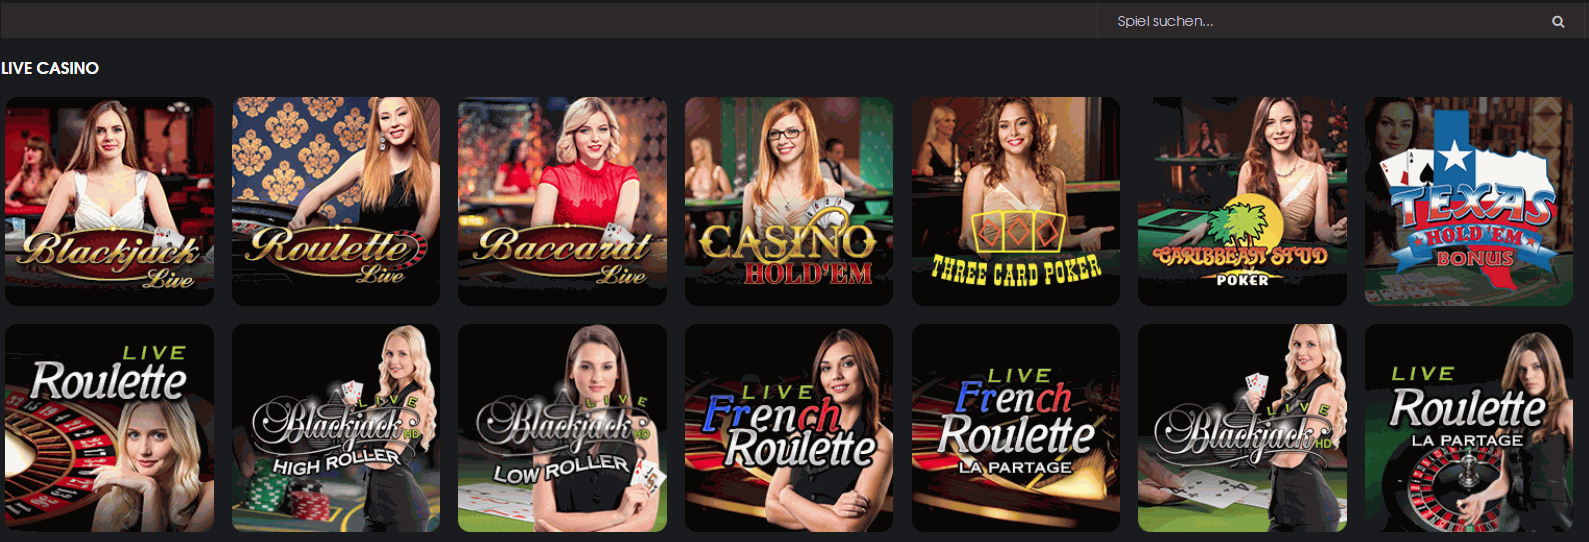 Betsson Casino Sportwetten 584546